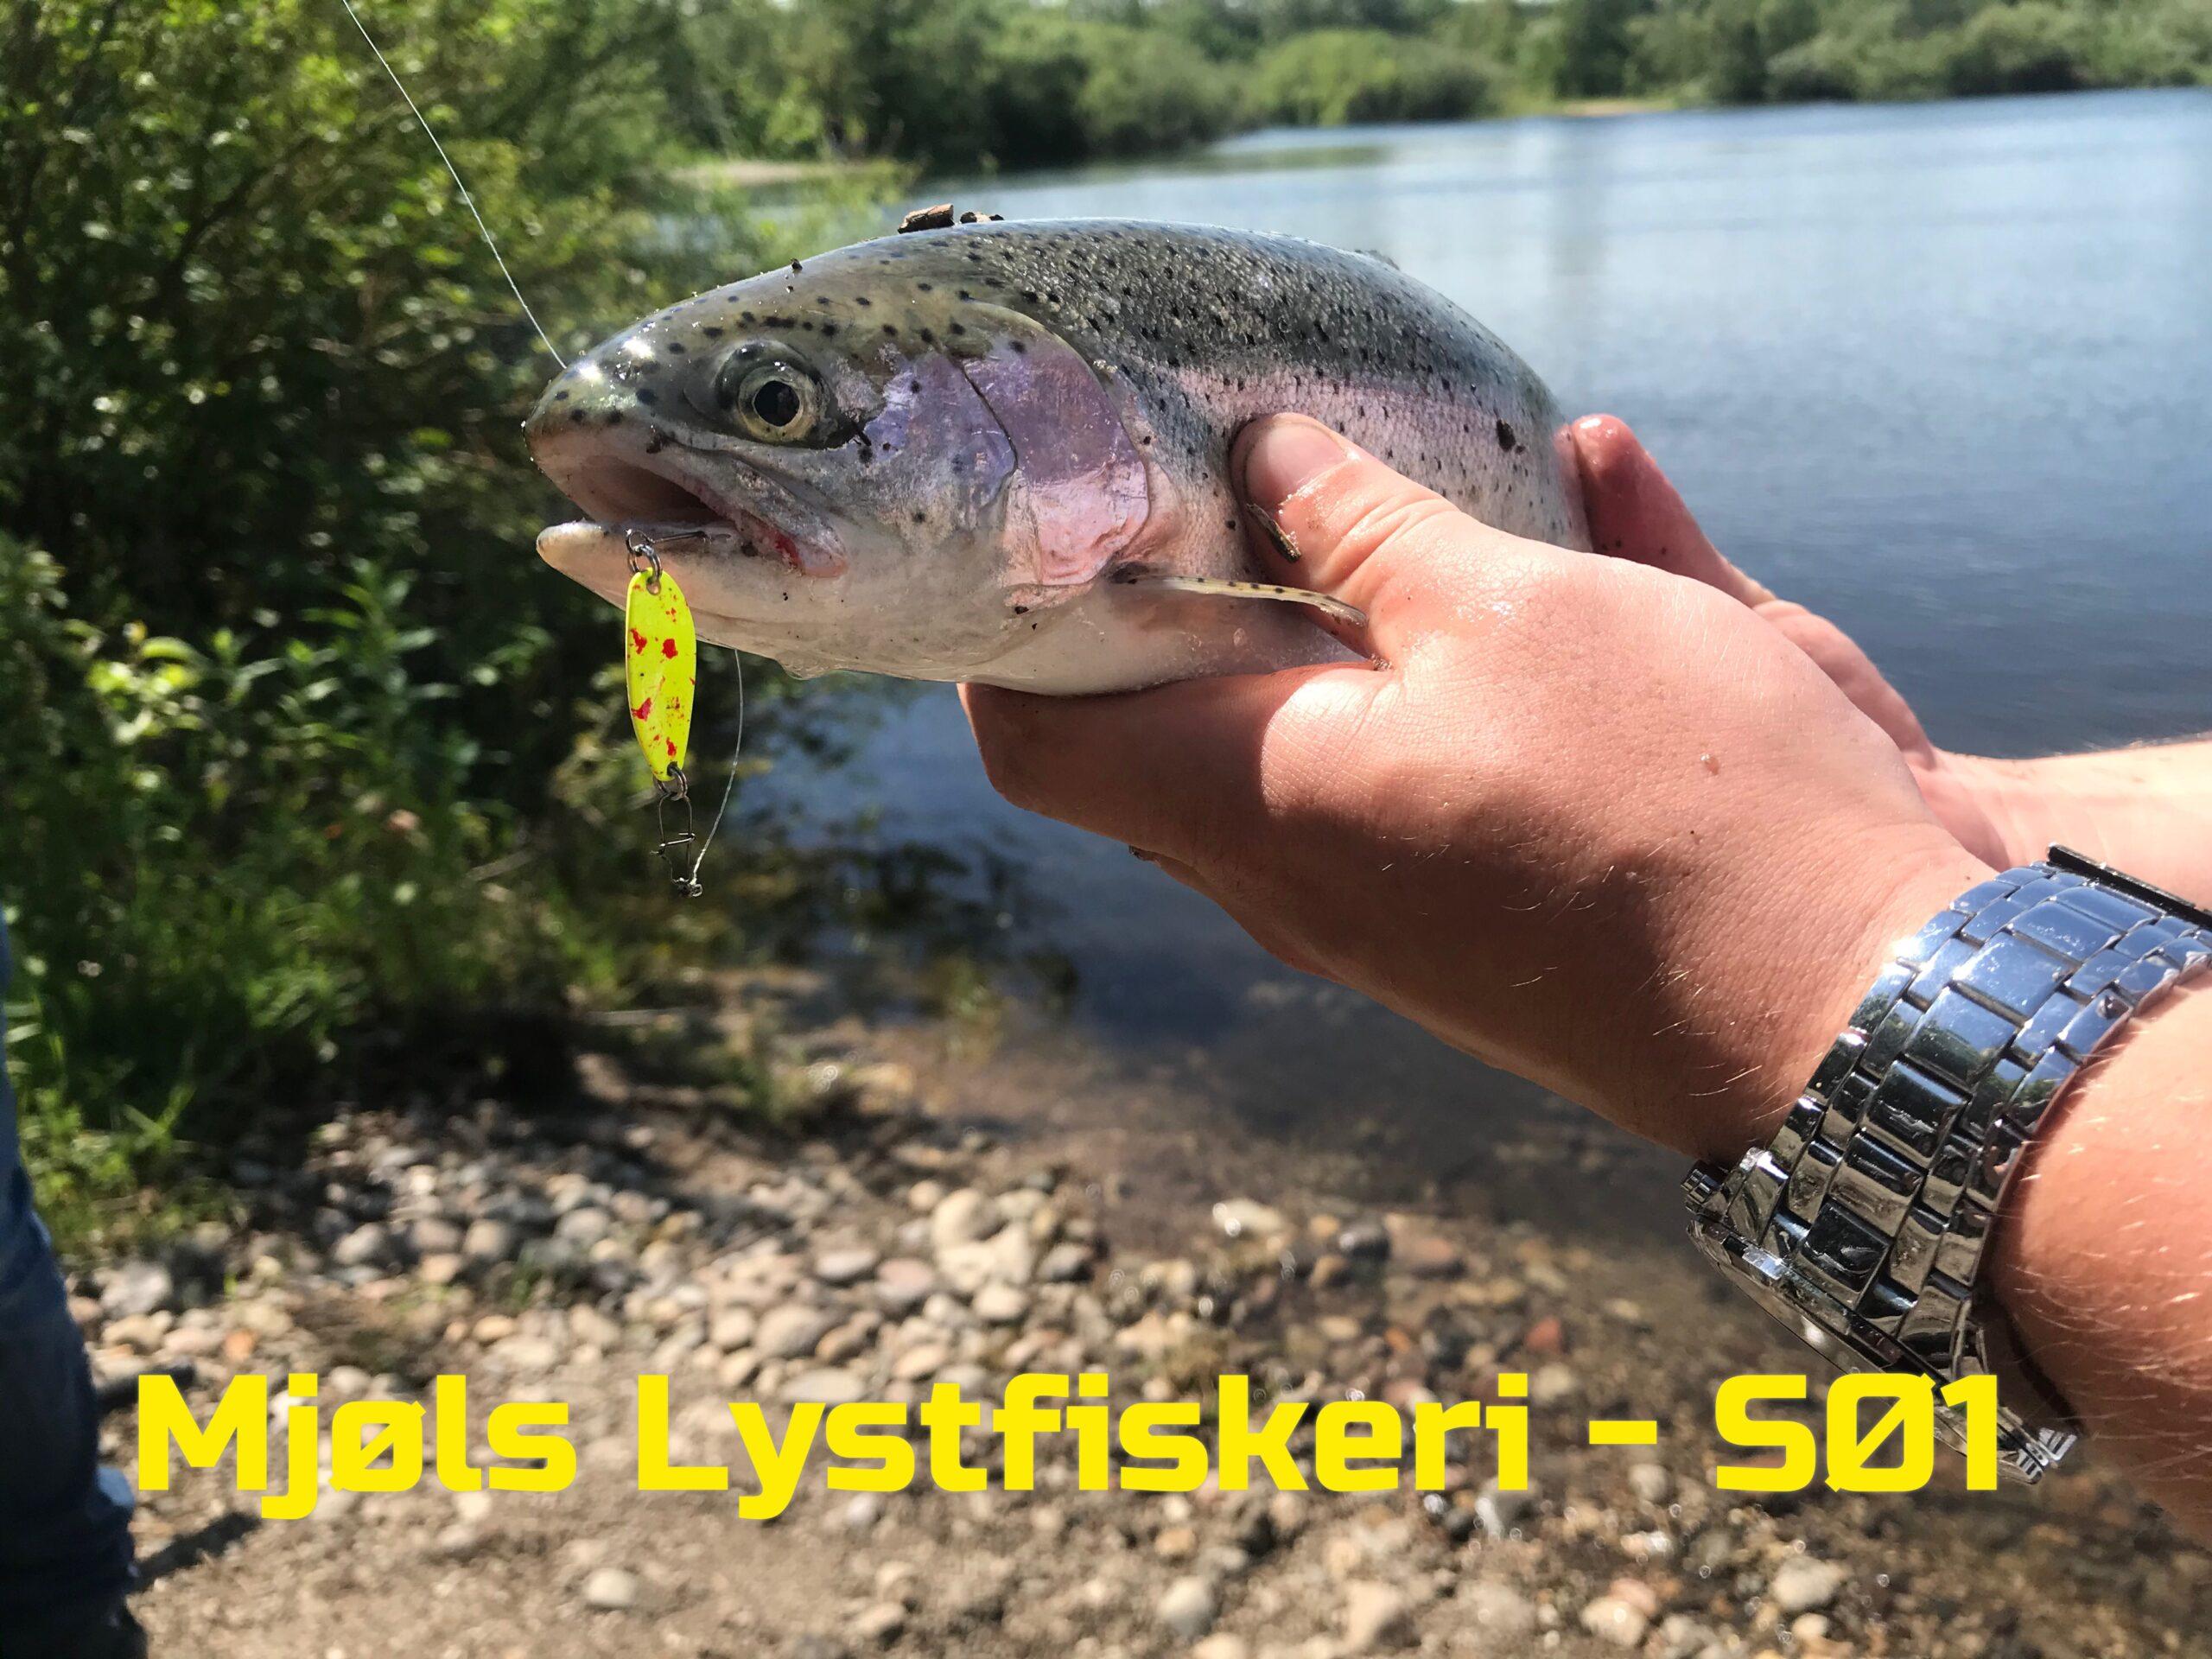 Mjøls Lystfiskeri: Små blink i krasse farver